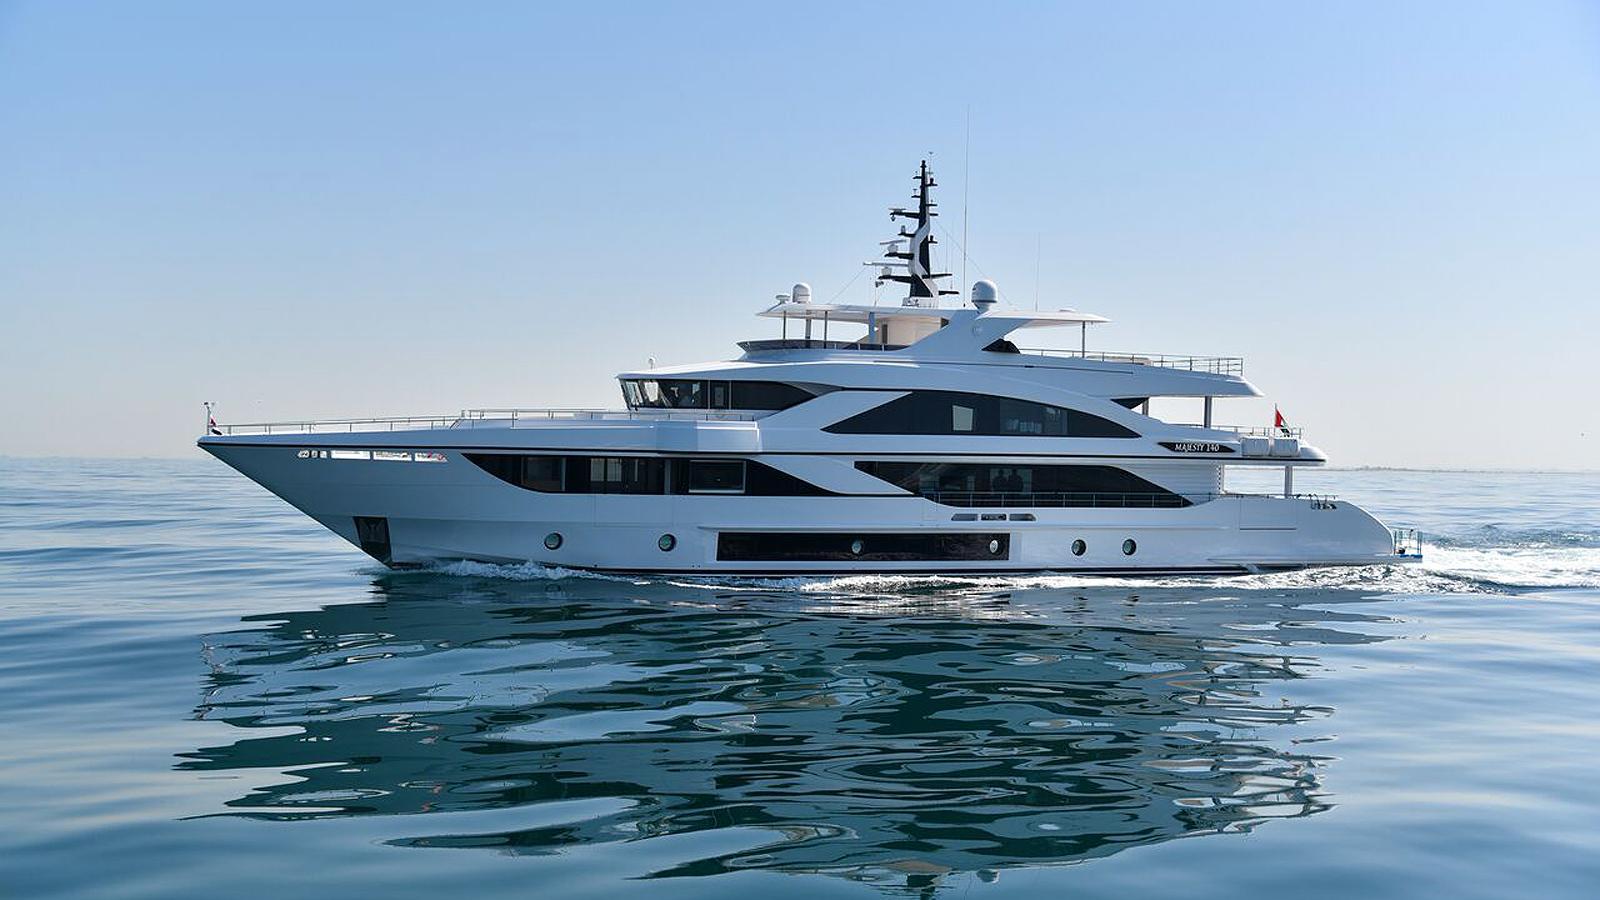 cest la vie majesty 140 motoryacht gulf craft 43m 2018 sea trials profile